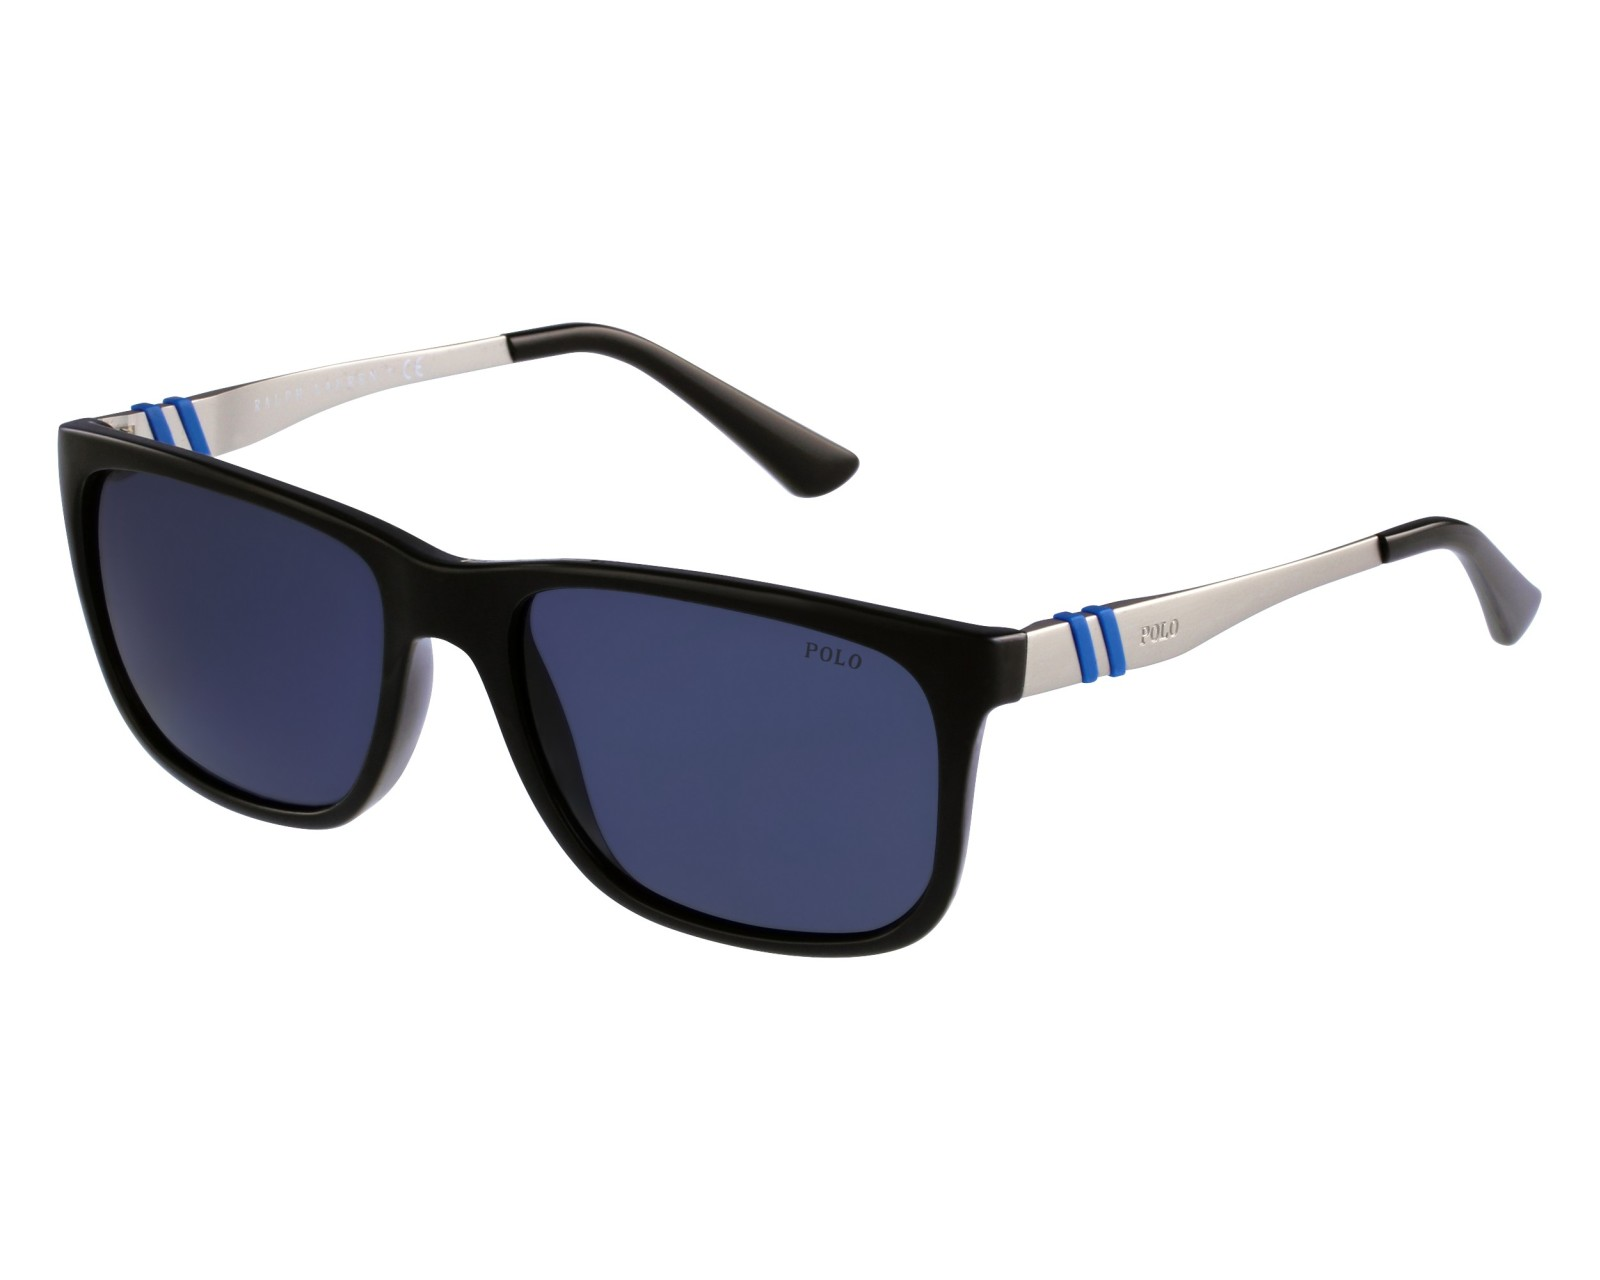 2b936ee8ba88 Sunglasses Polo Ralph Lauren PH-4088 5001/87 55-17 Black Silver front